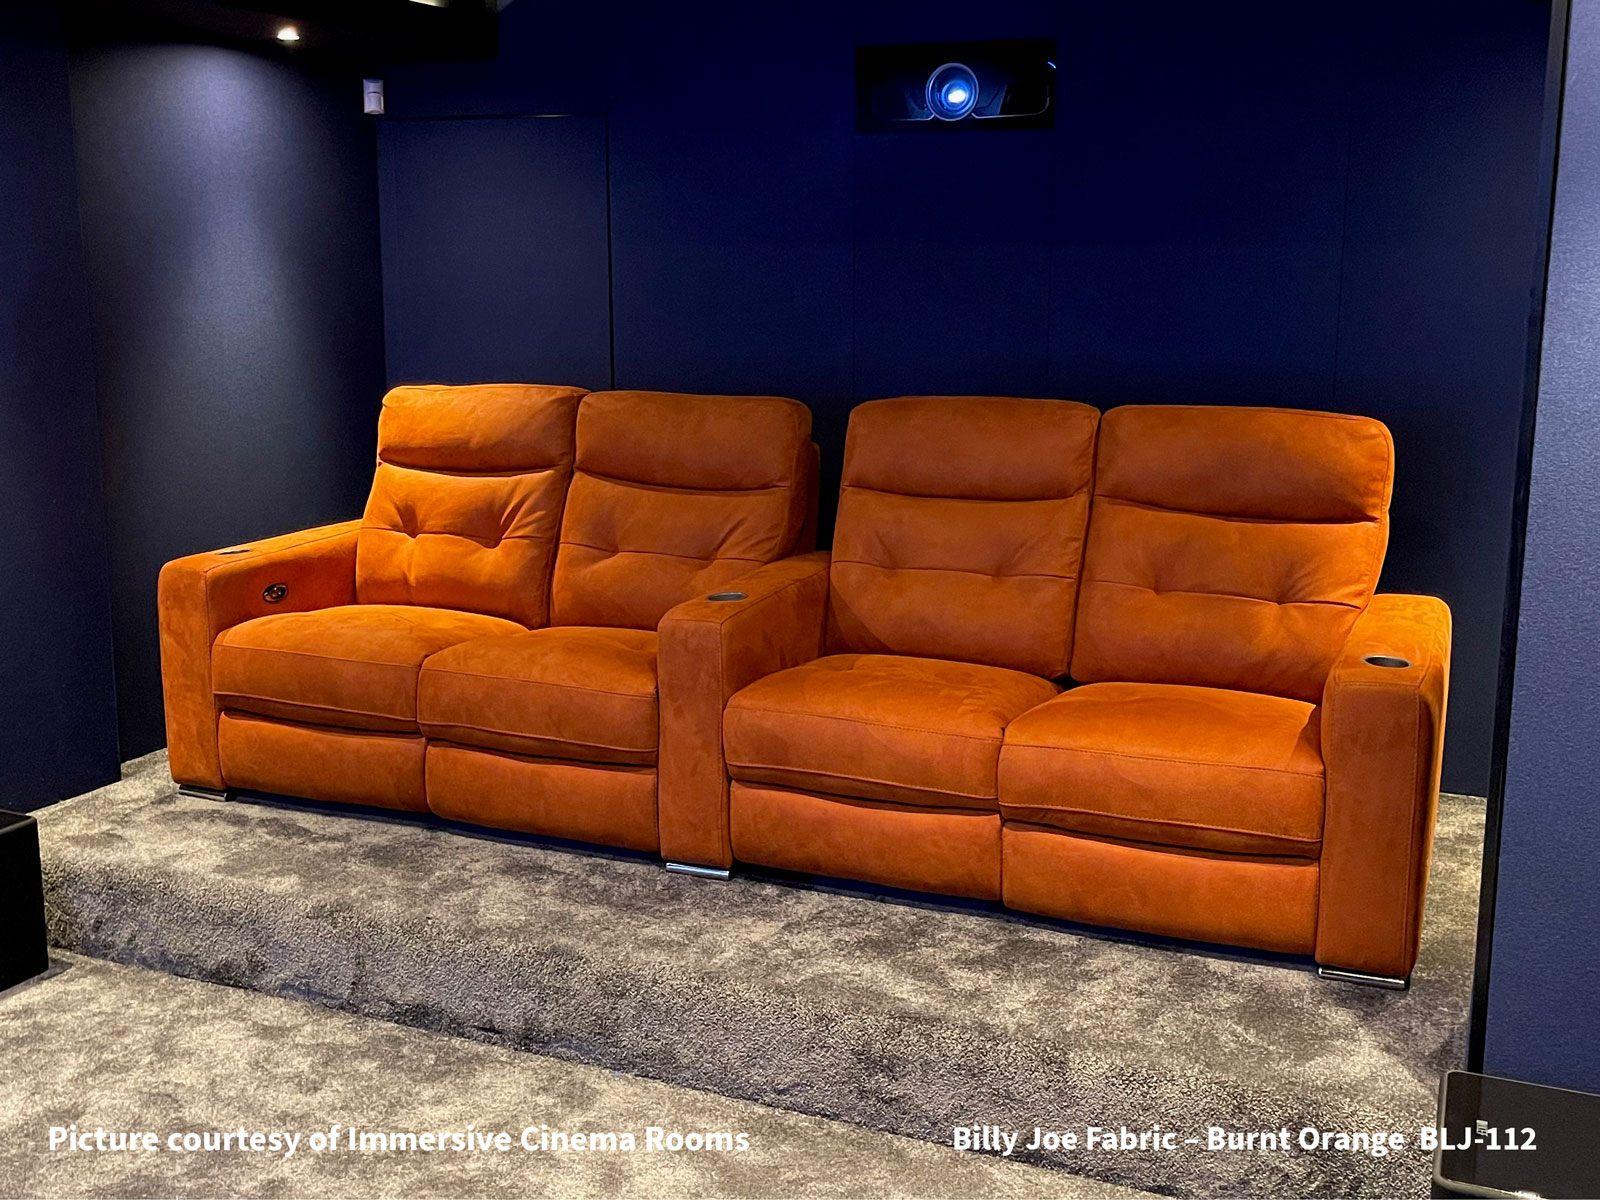 Billy Joe Fabric – Burnt Orange BLJ-112